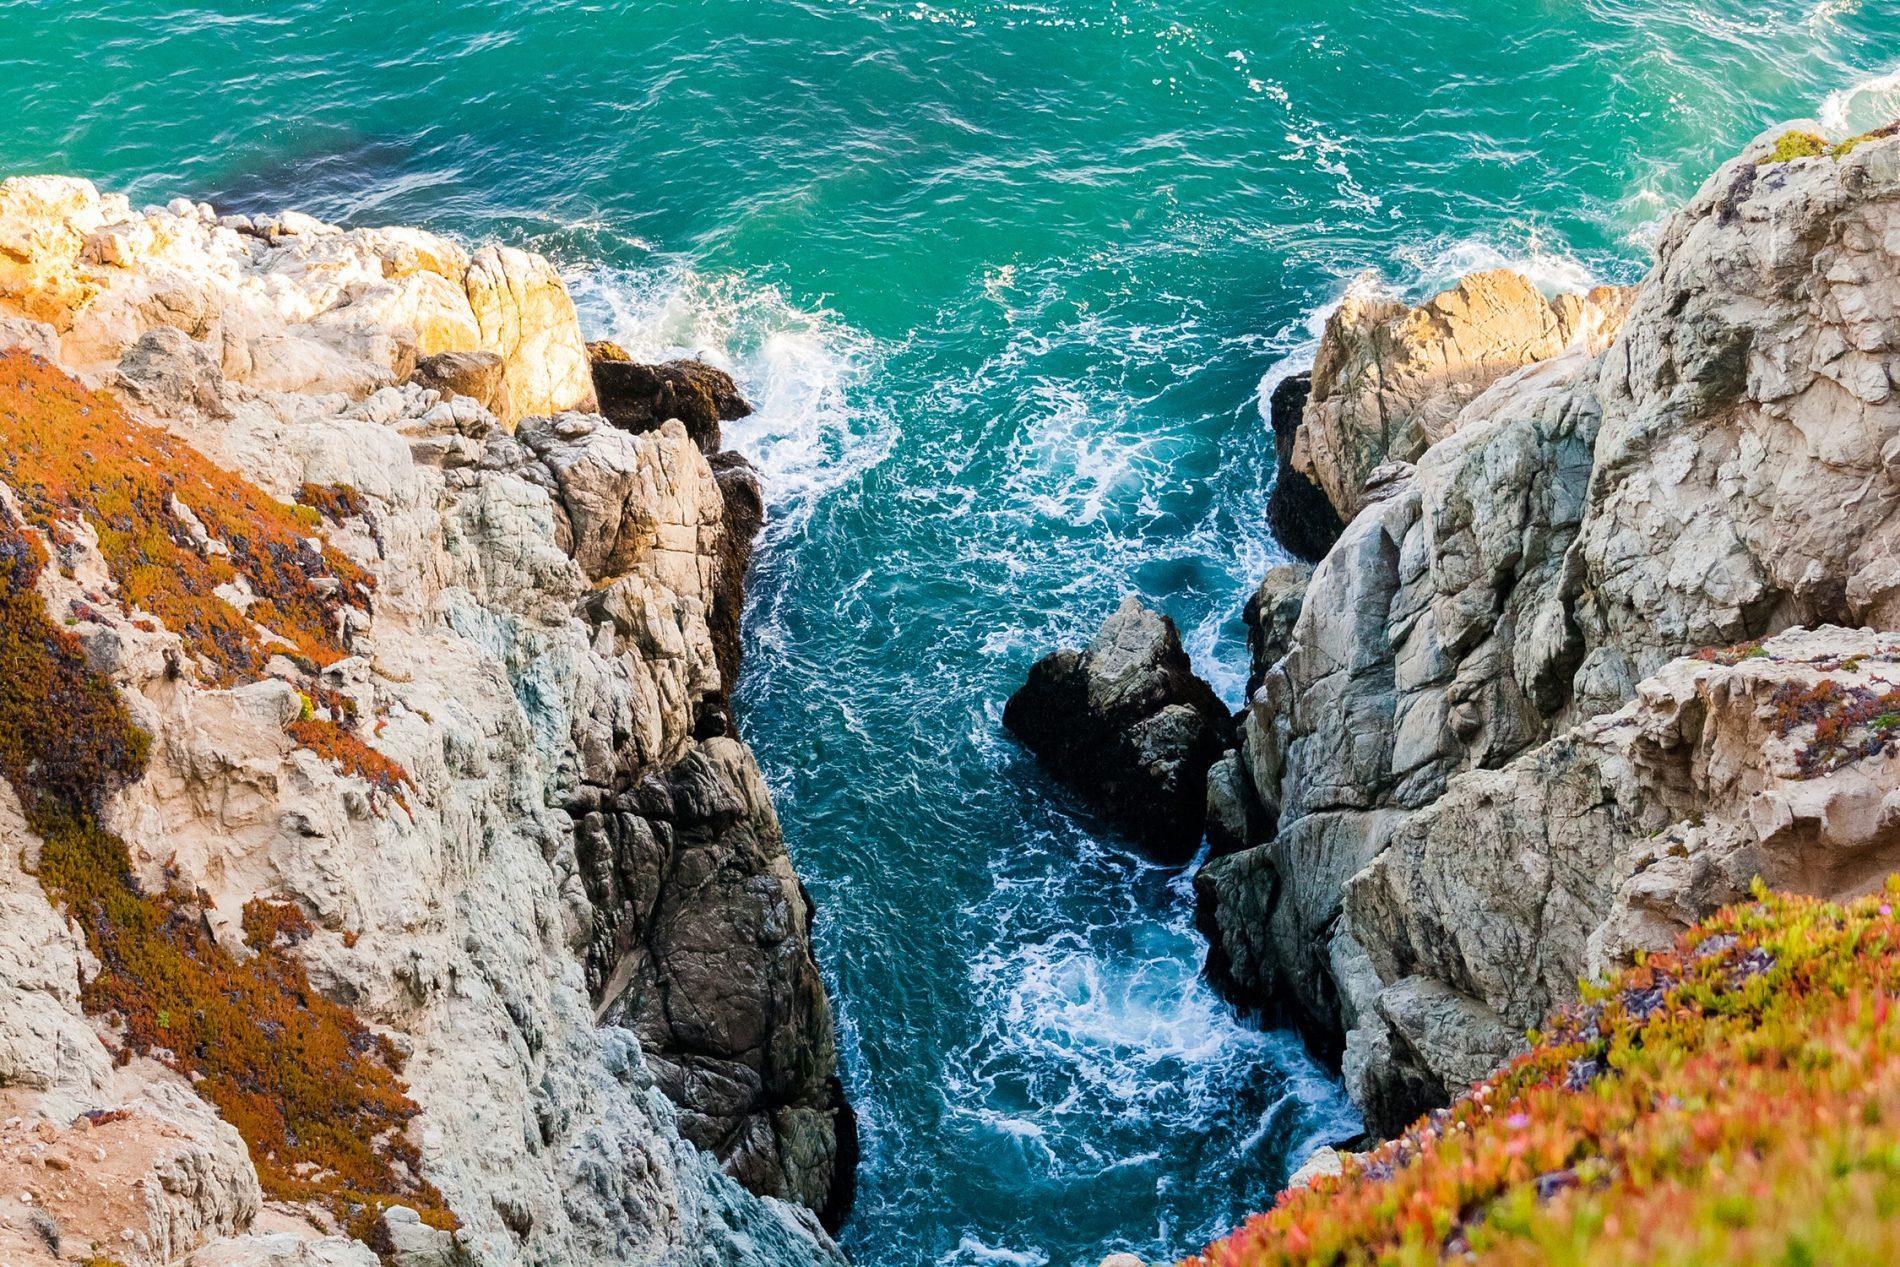 Breathtaking Photography – Week 15